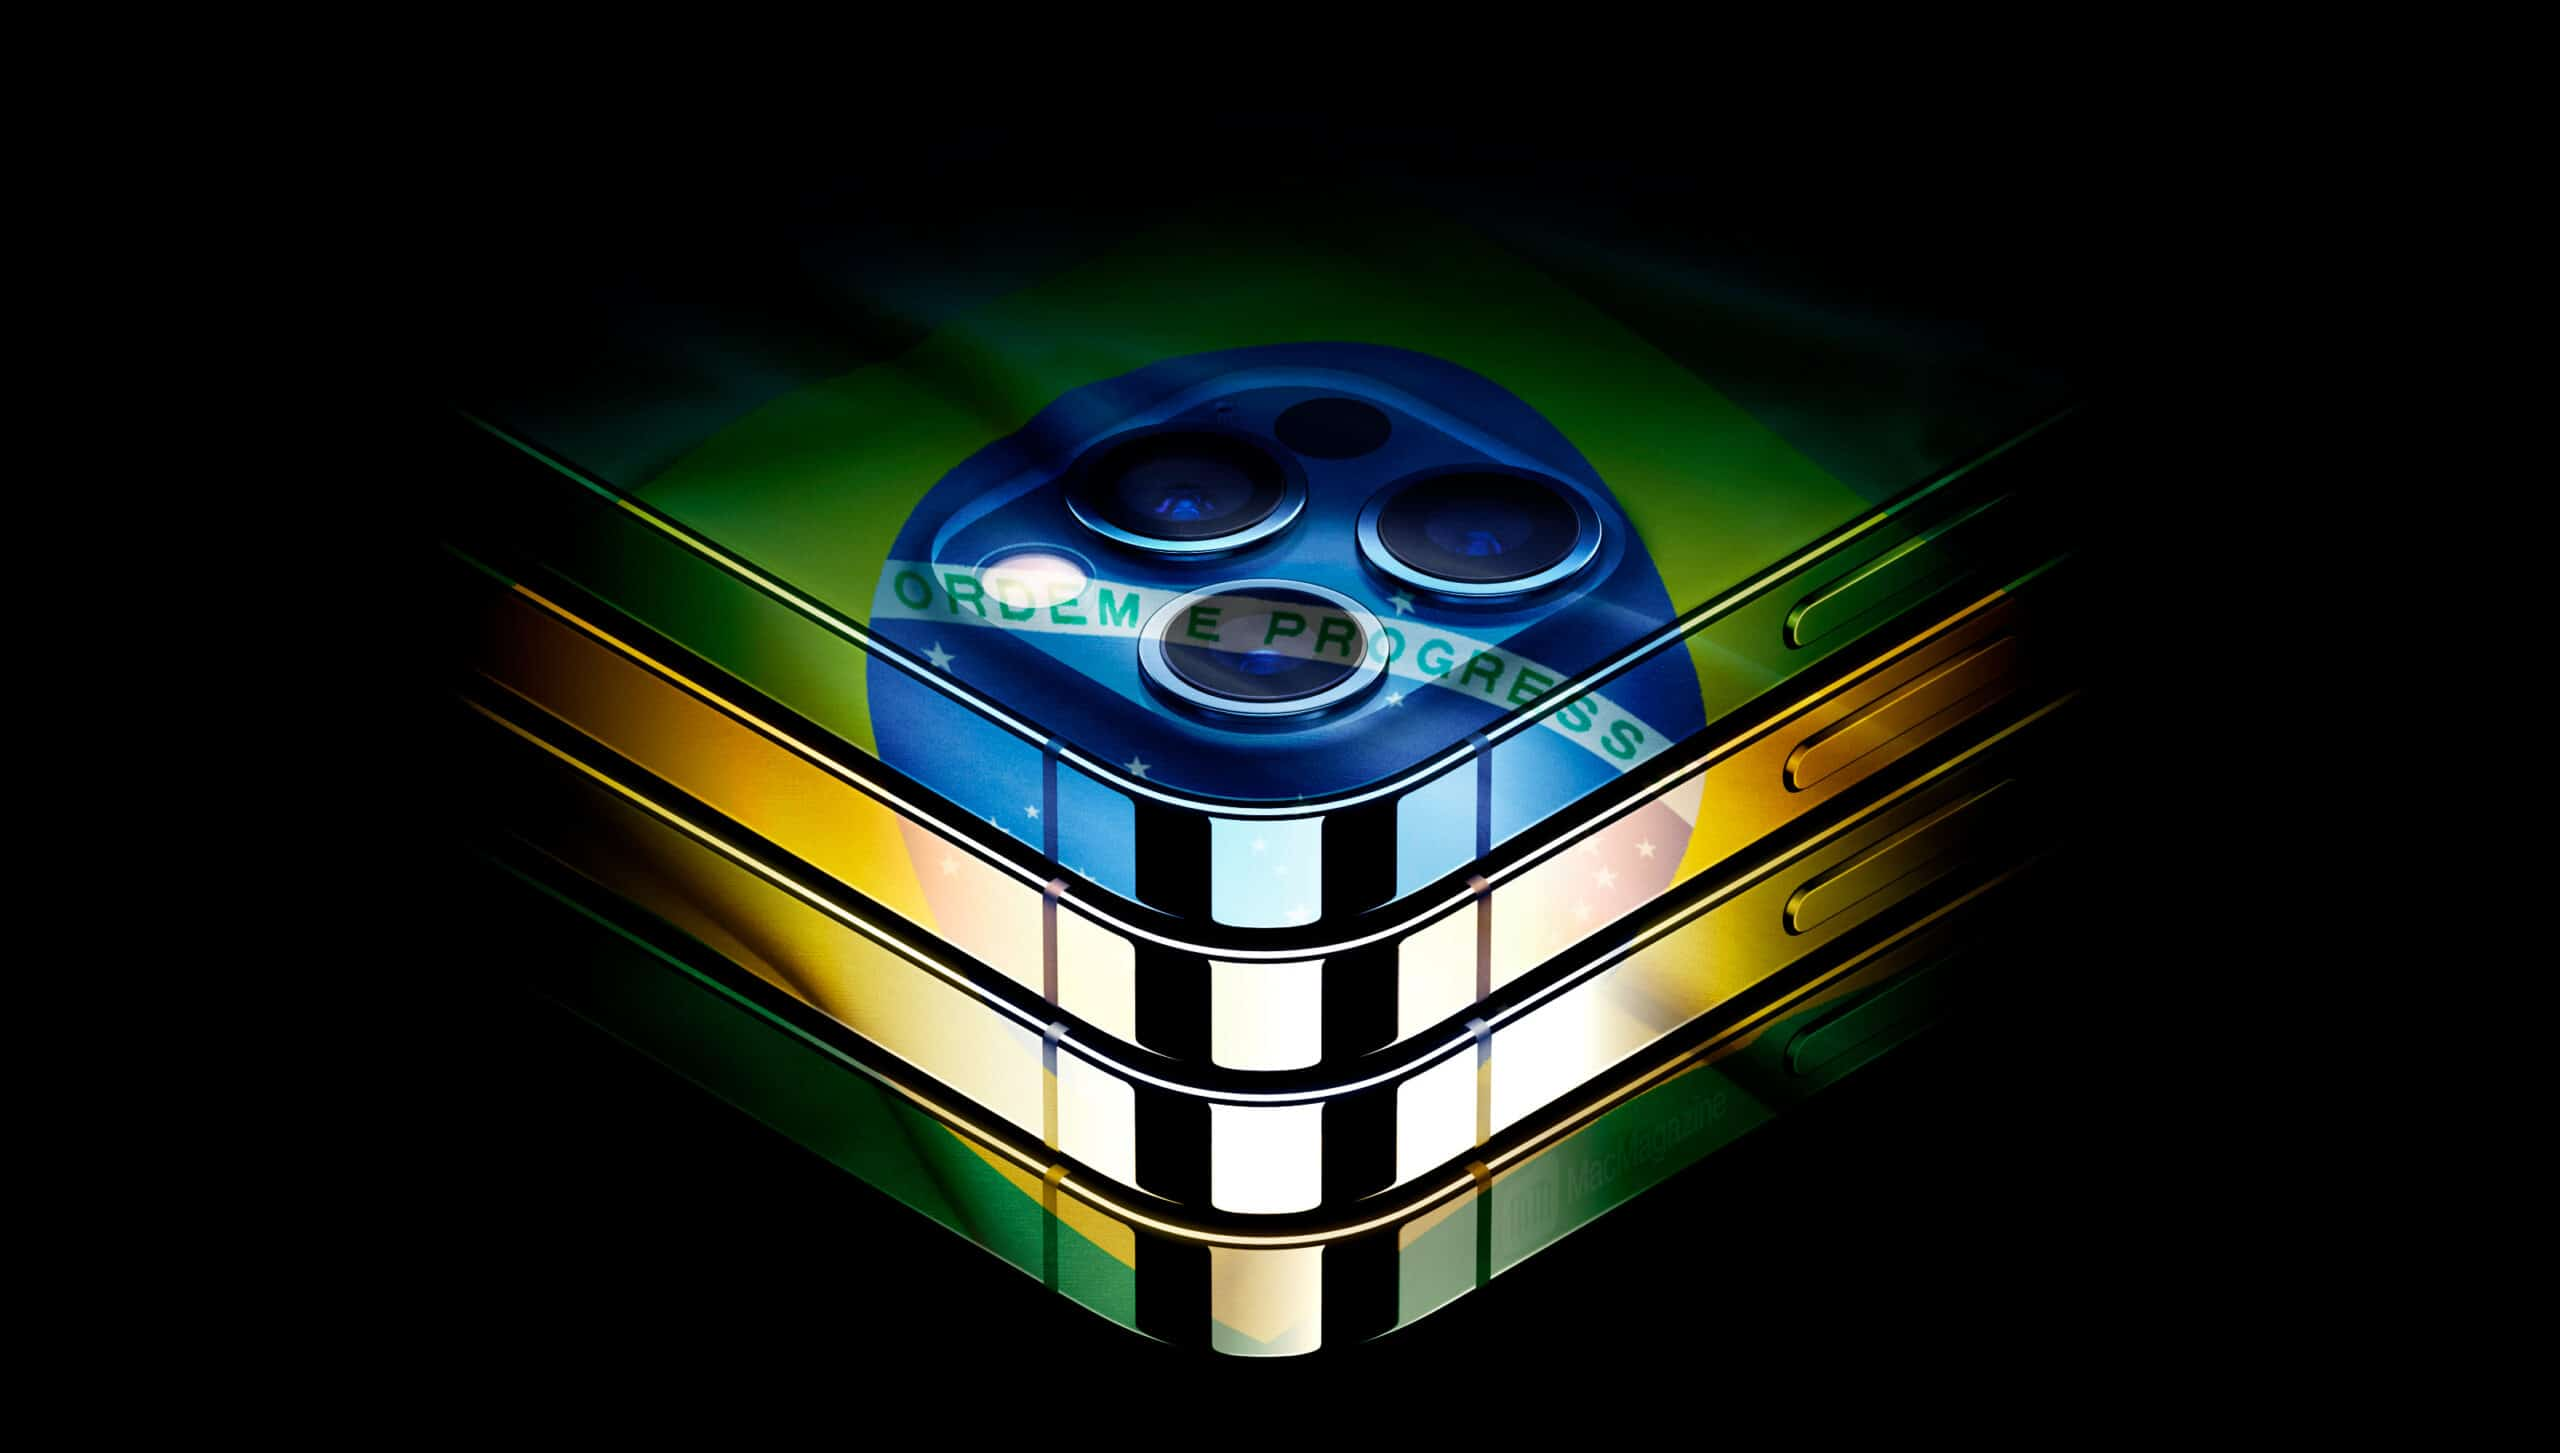 iPhones 12 Pro com a bandeira do Brasil (by MacMagazine)